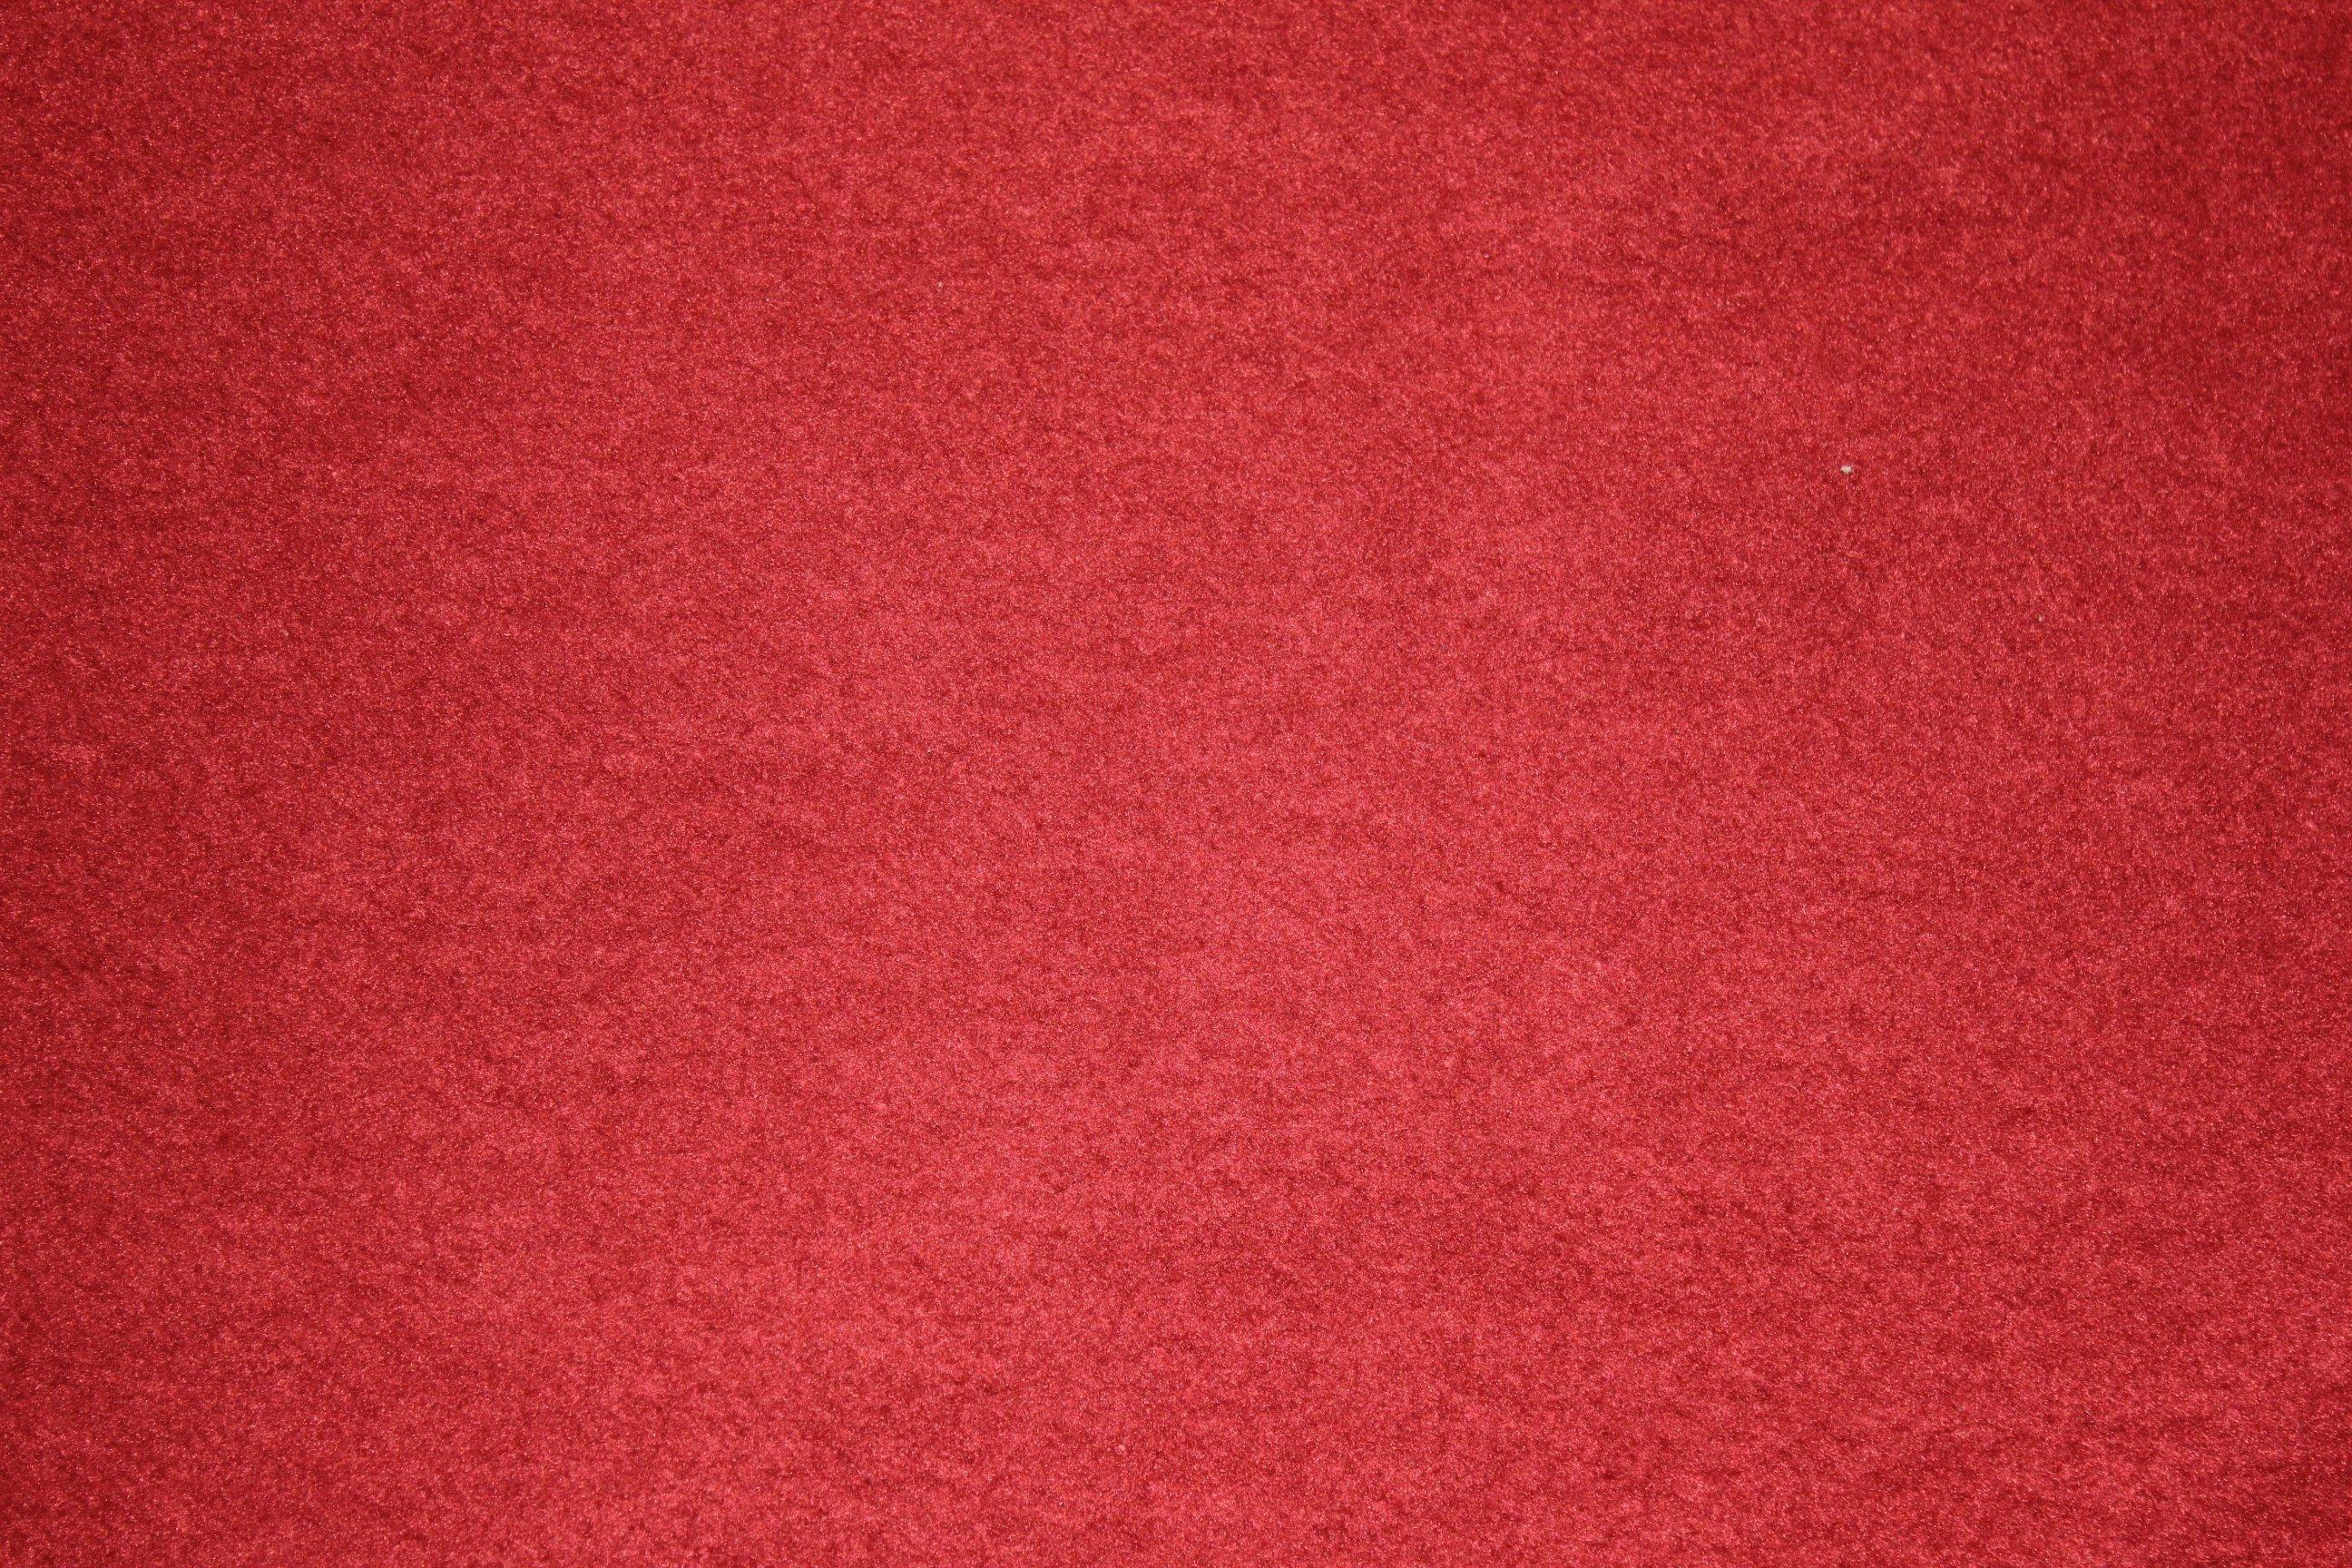 Красный материал картинки